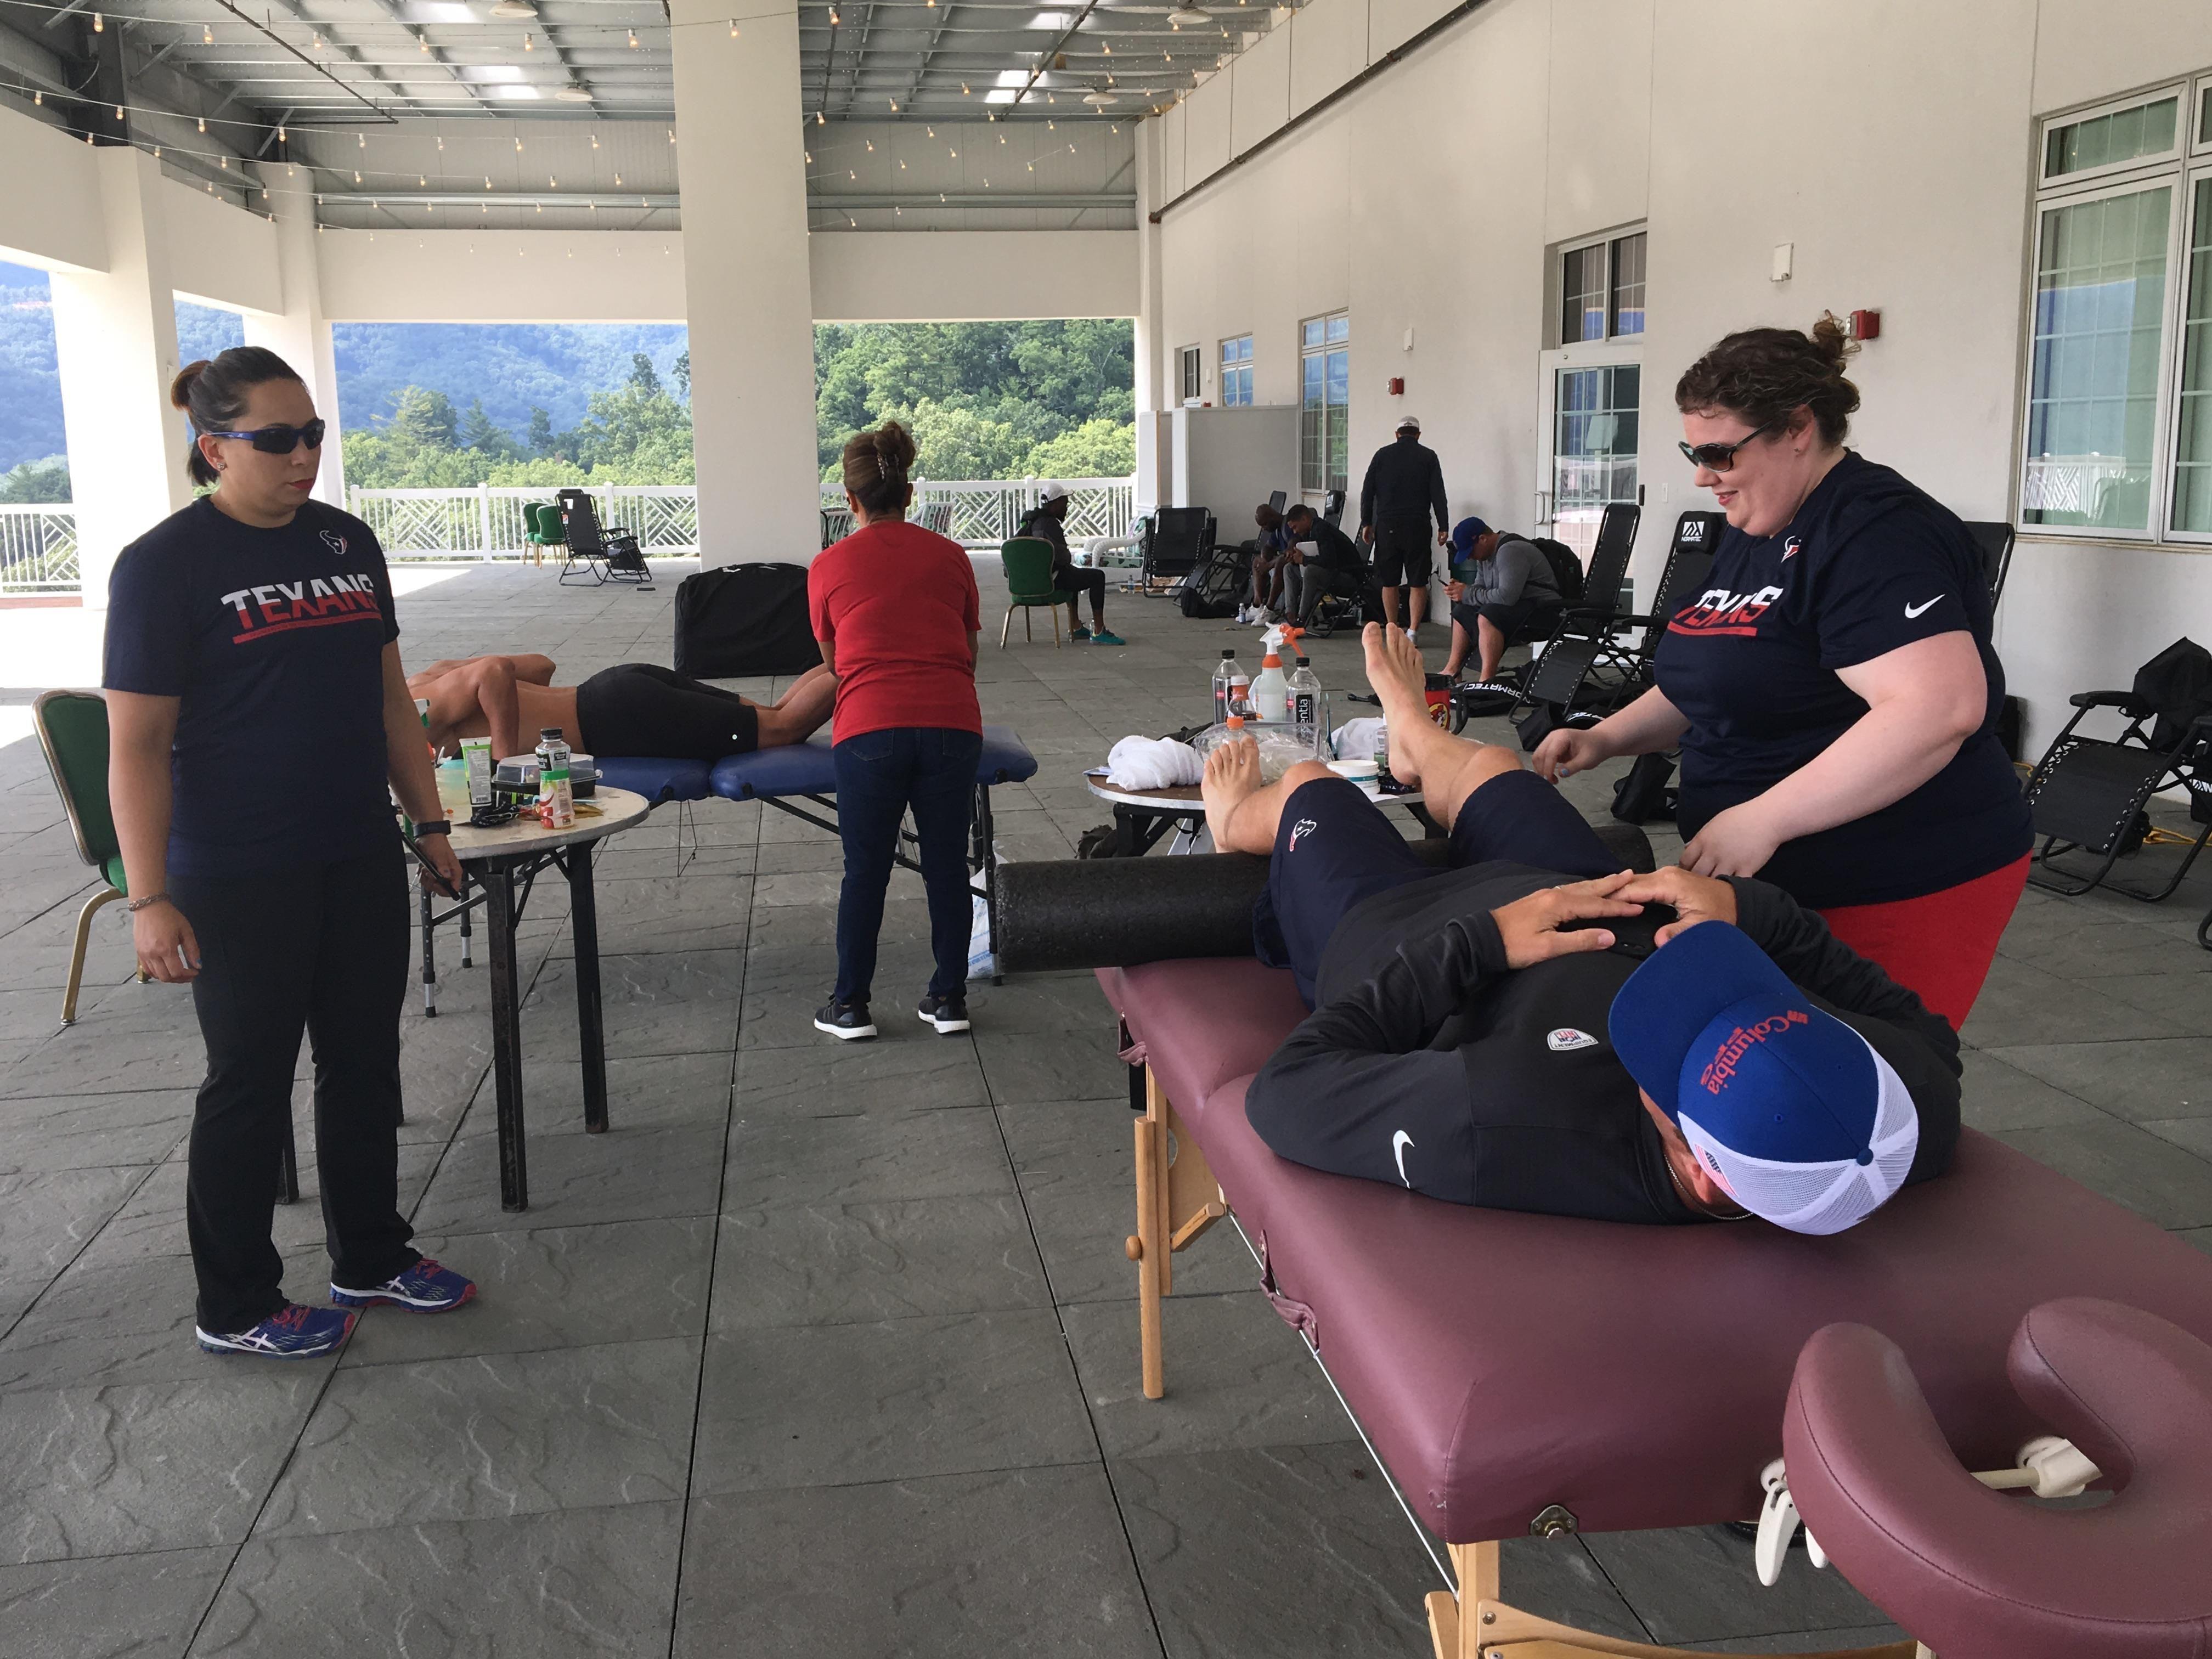 chair king sugar land timber ridge zero gravity genuine touch massage clinic in tx 77478